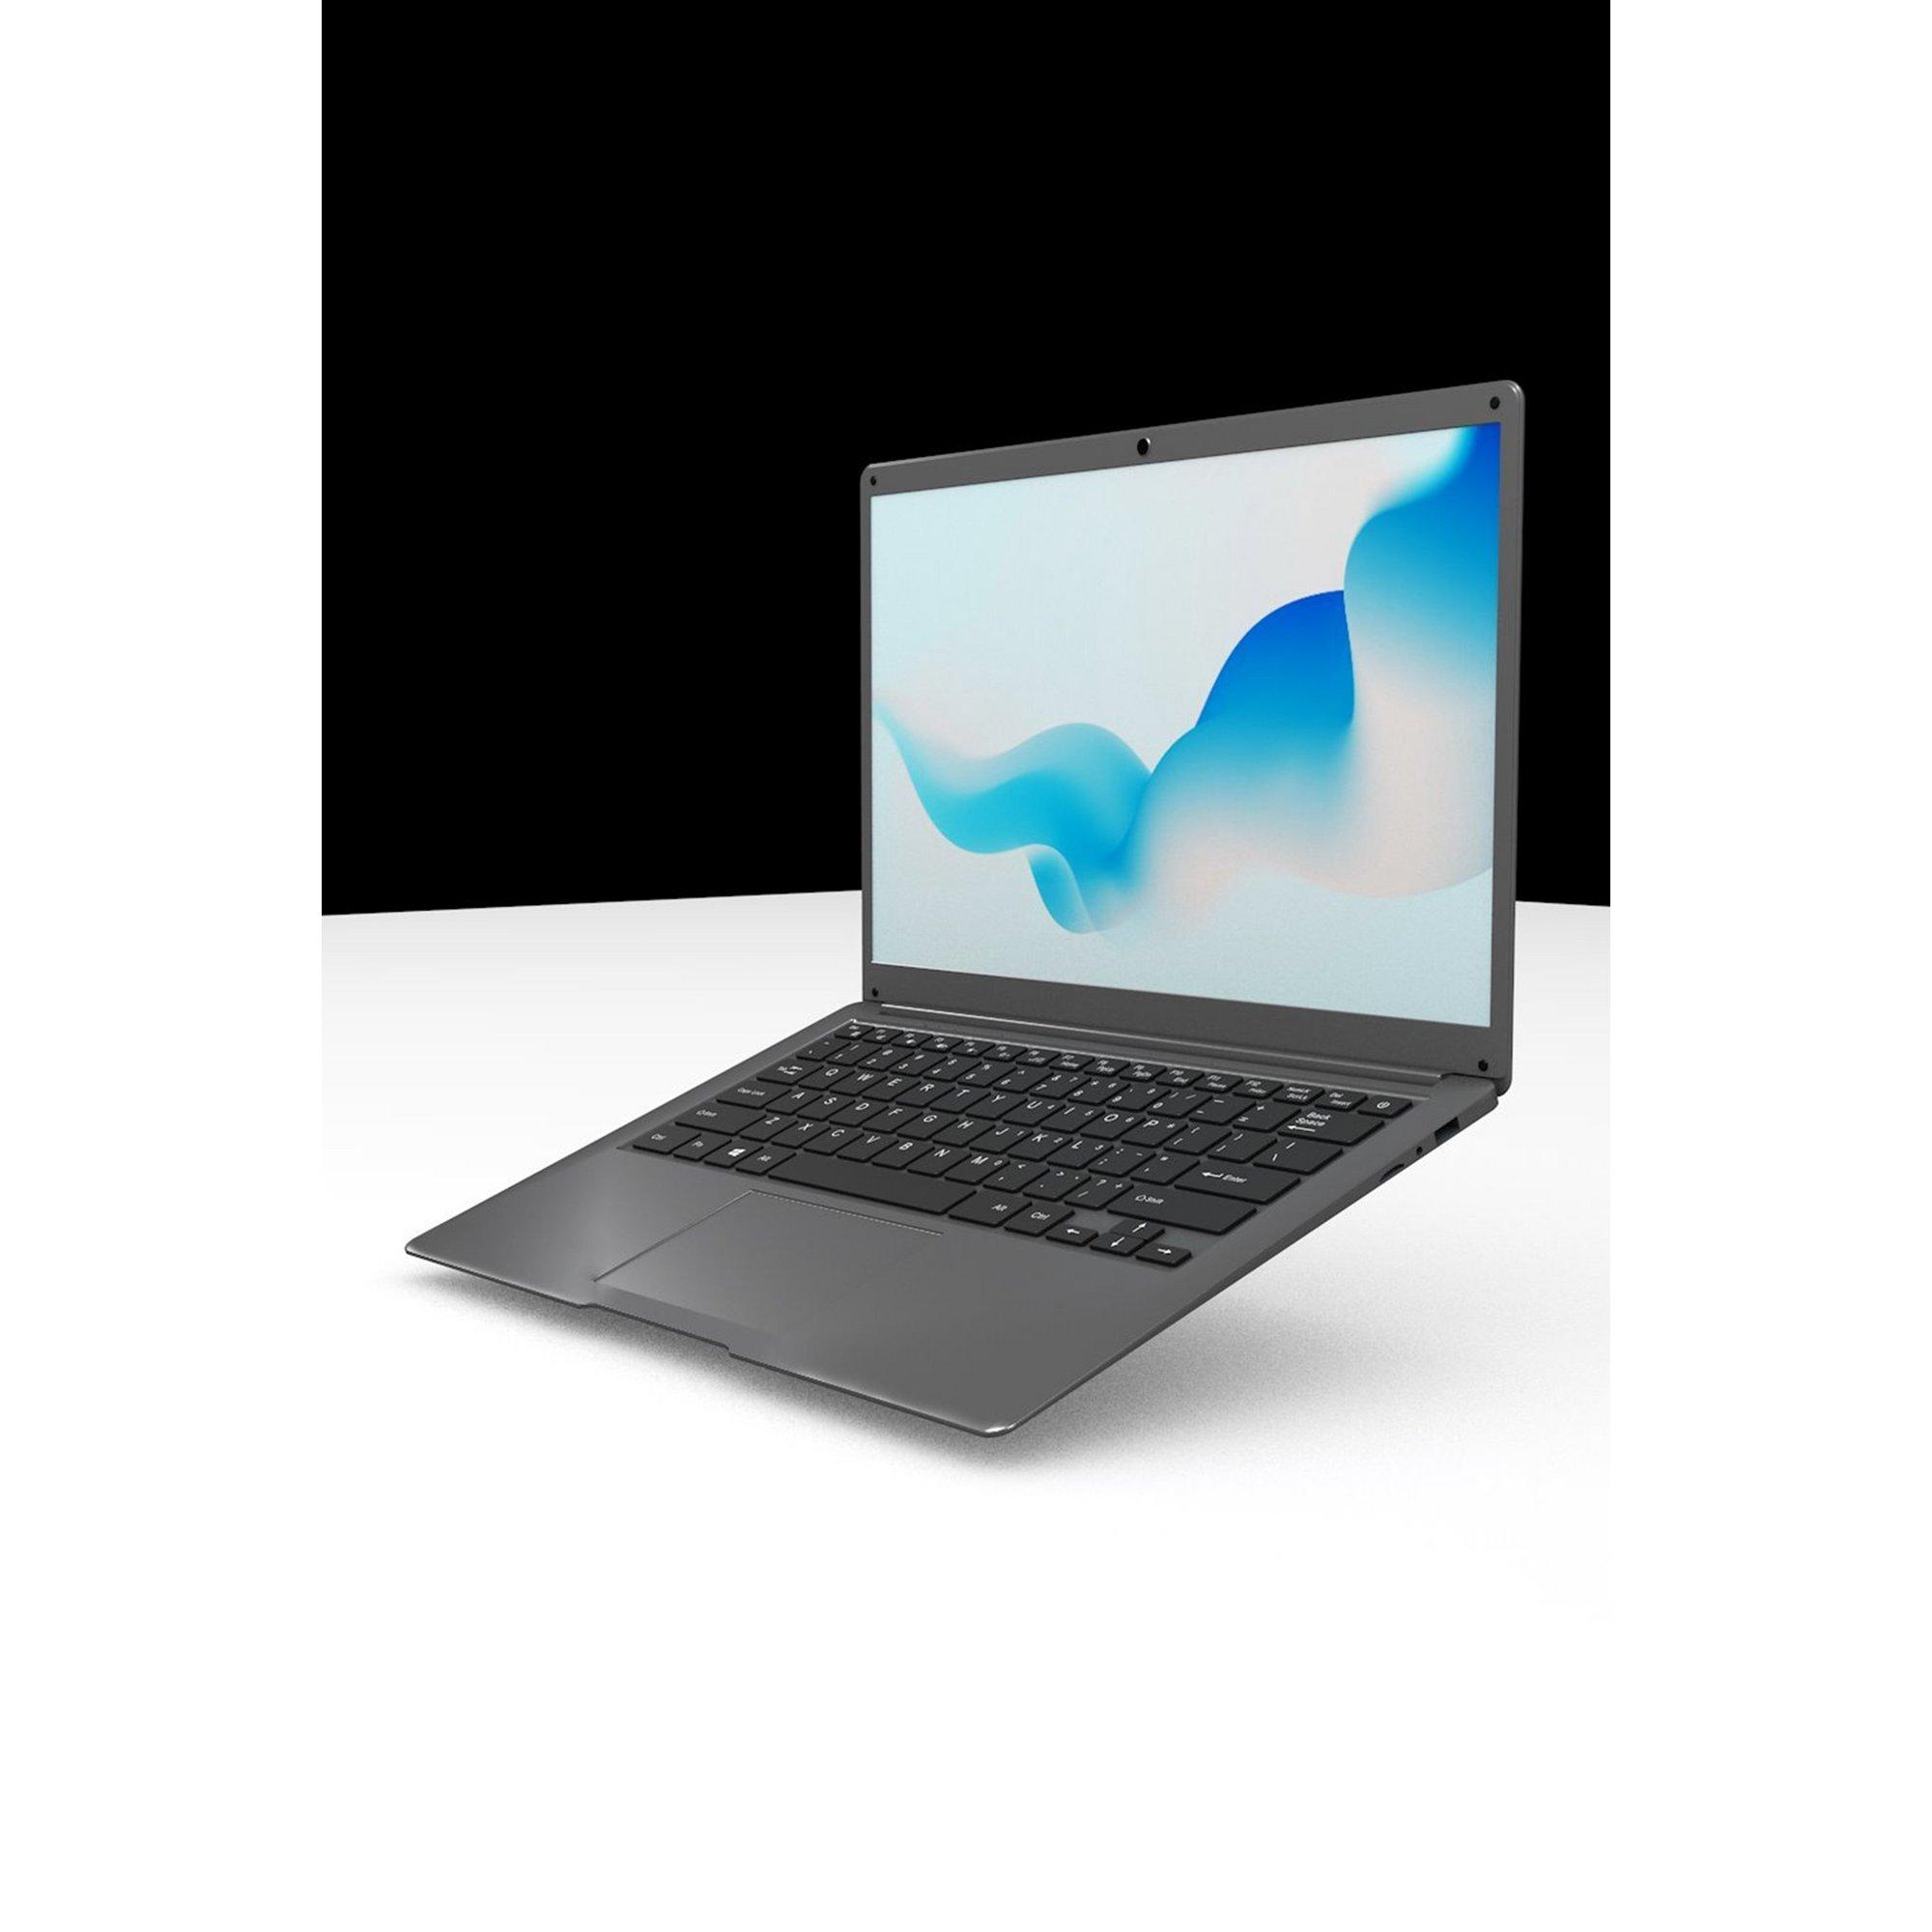 Image of Bocconi V146A 14.1 Inch Windows 10 64GB + 120GB SSD Laptop + 32GB...